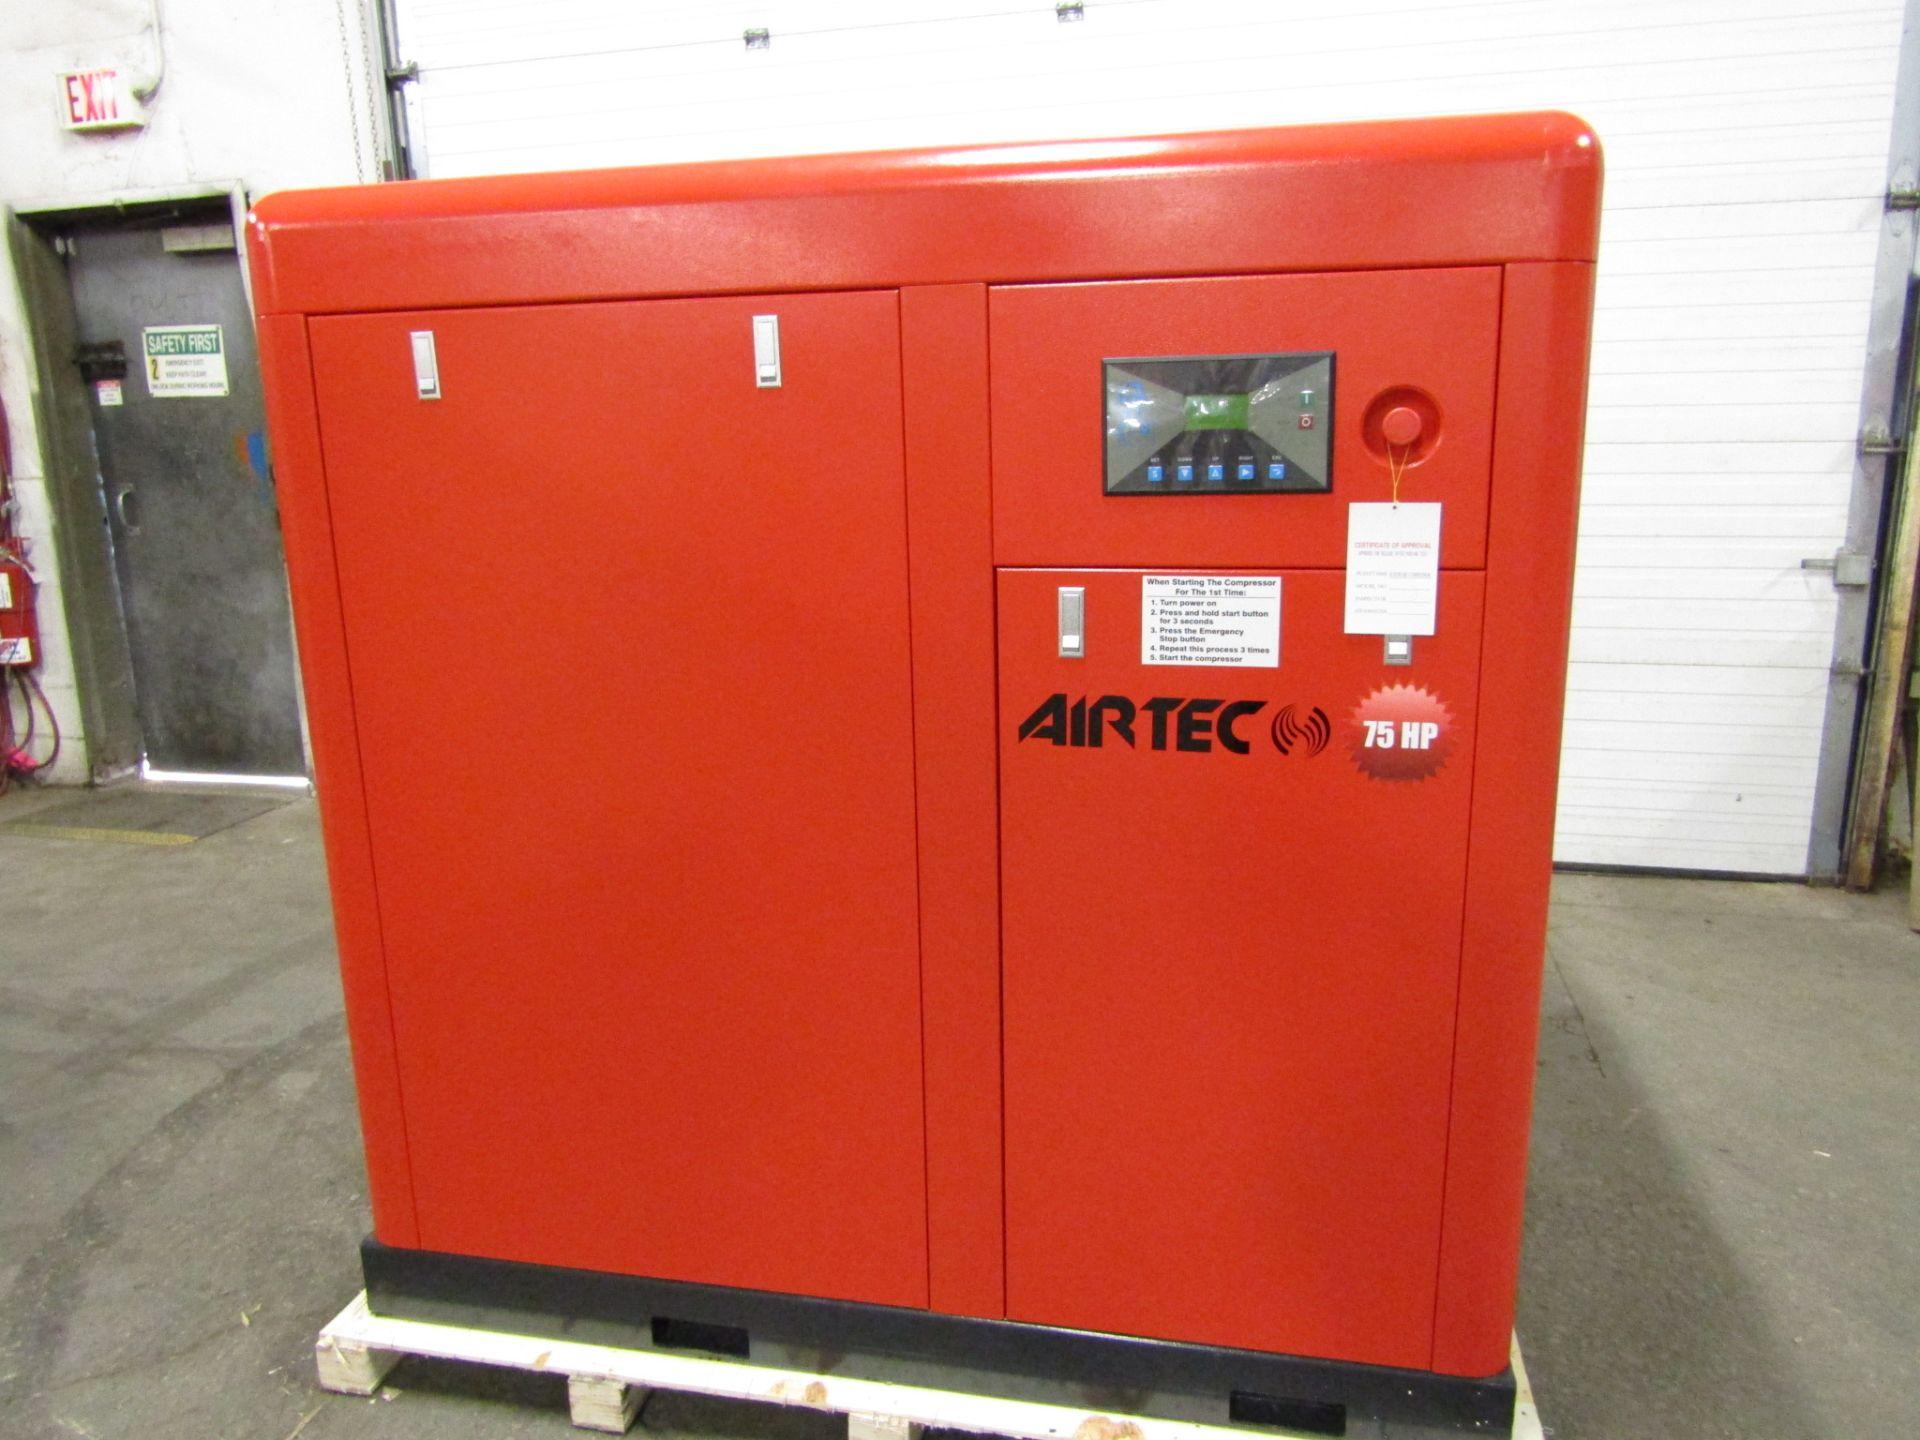 Airtec 75HP Rotary Screw Air Compressor - MINT UNUSED COMPRESSOR